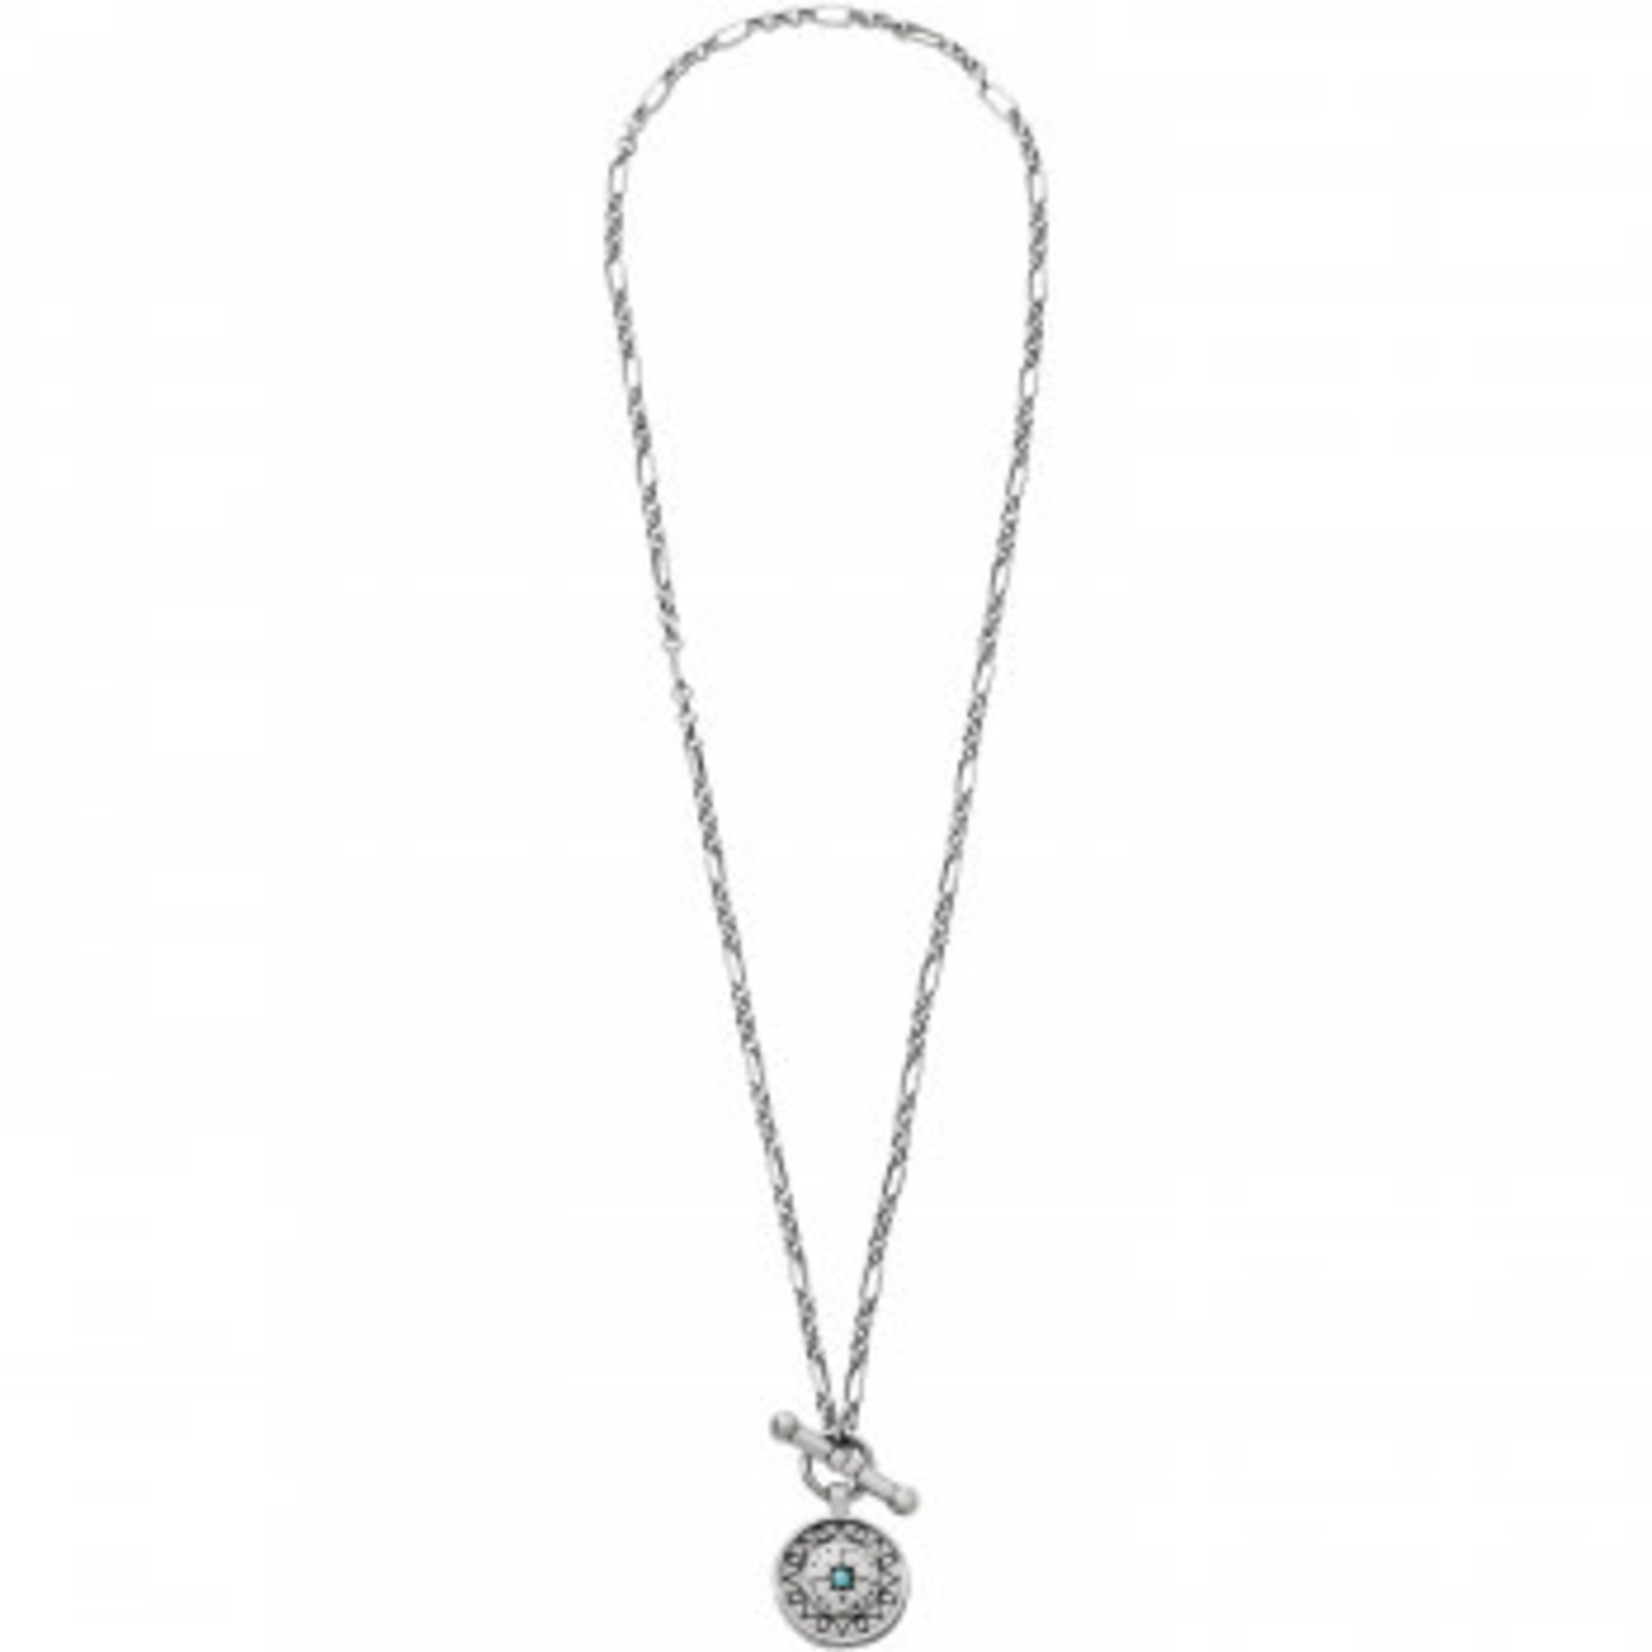 Brighton Marrakesh Mystique Short Toggle Necklace Silver-Turquoise